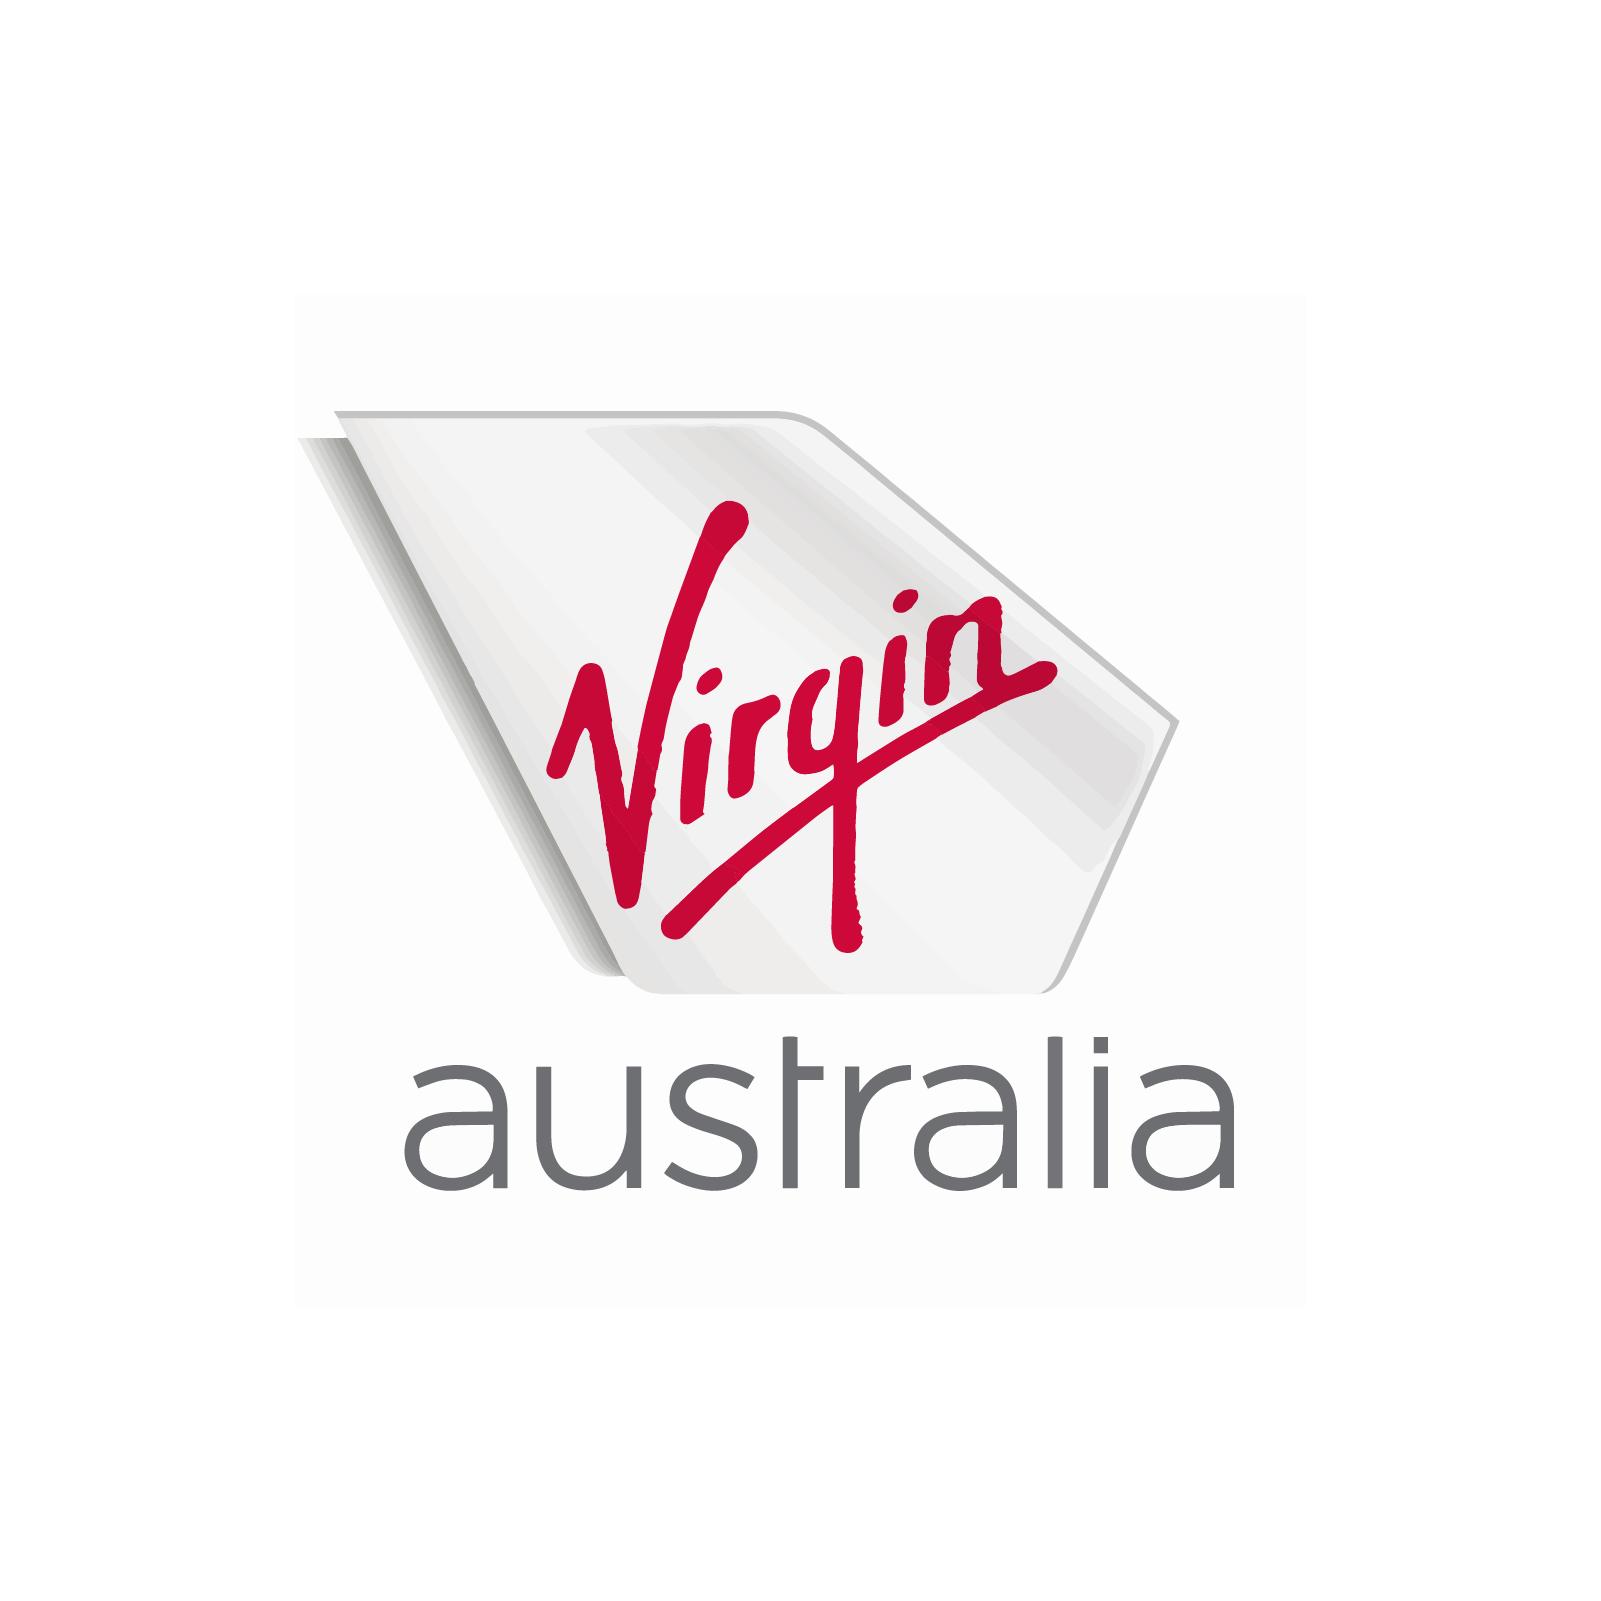 Press Logos_Virgin Australia.png